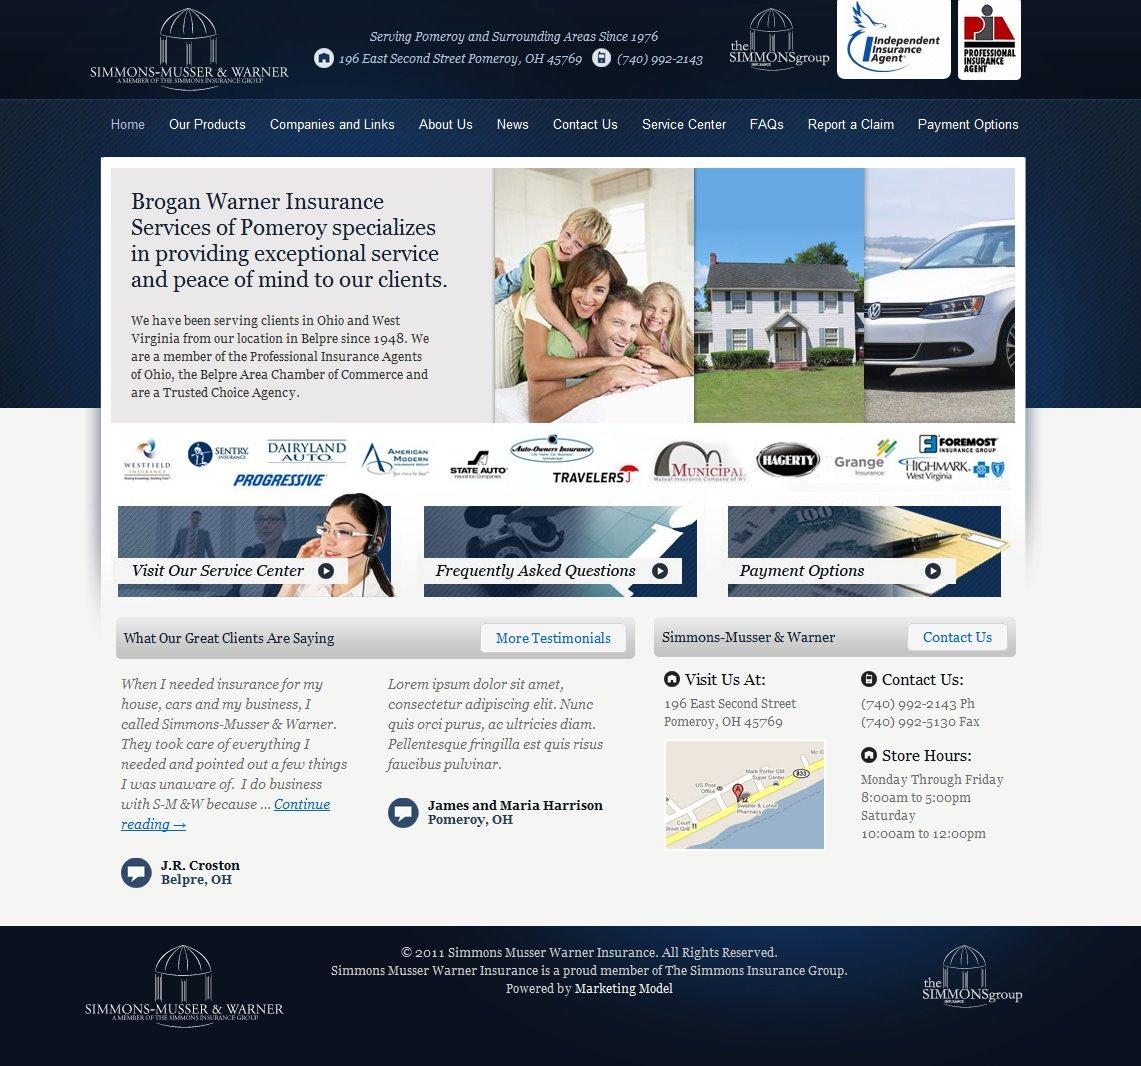 Web Design for Simmons Musser Warner